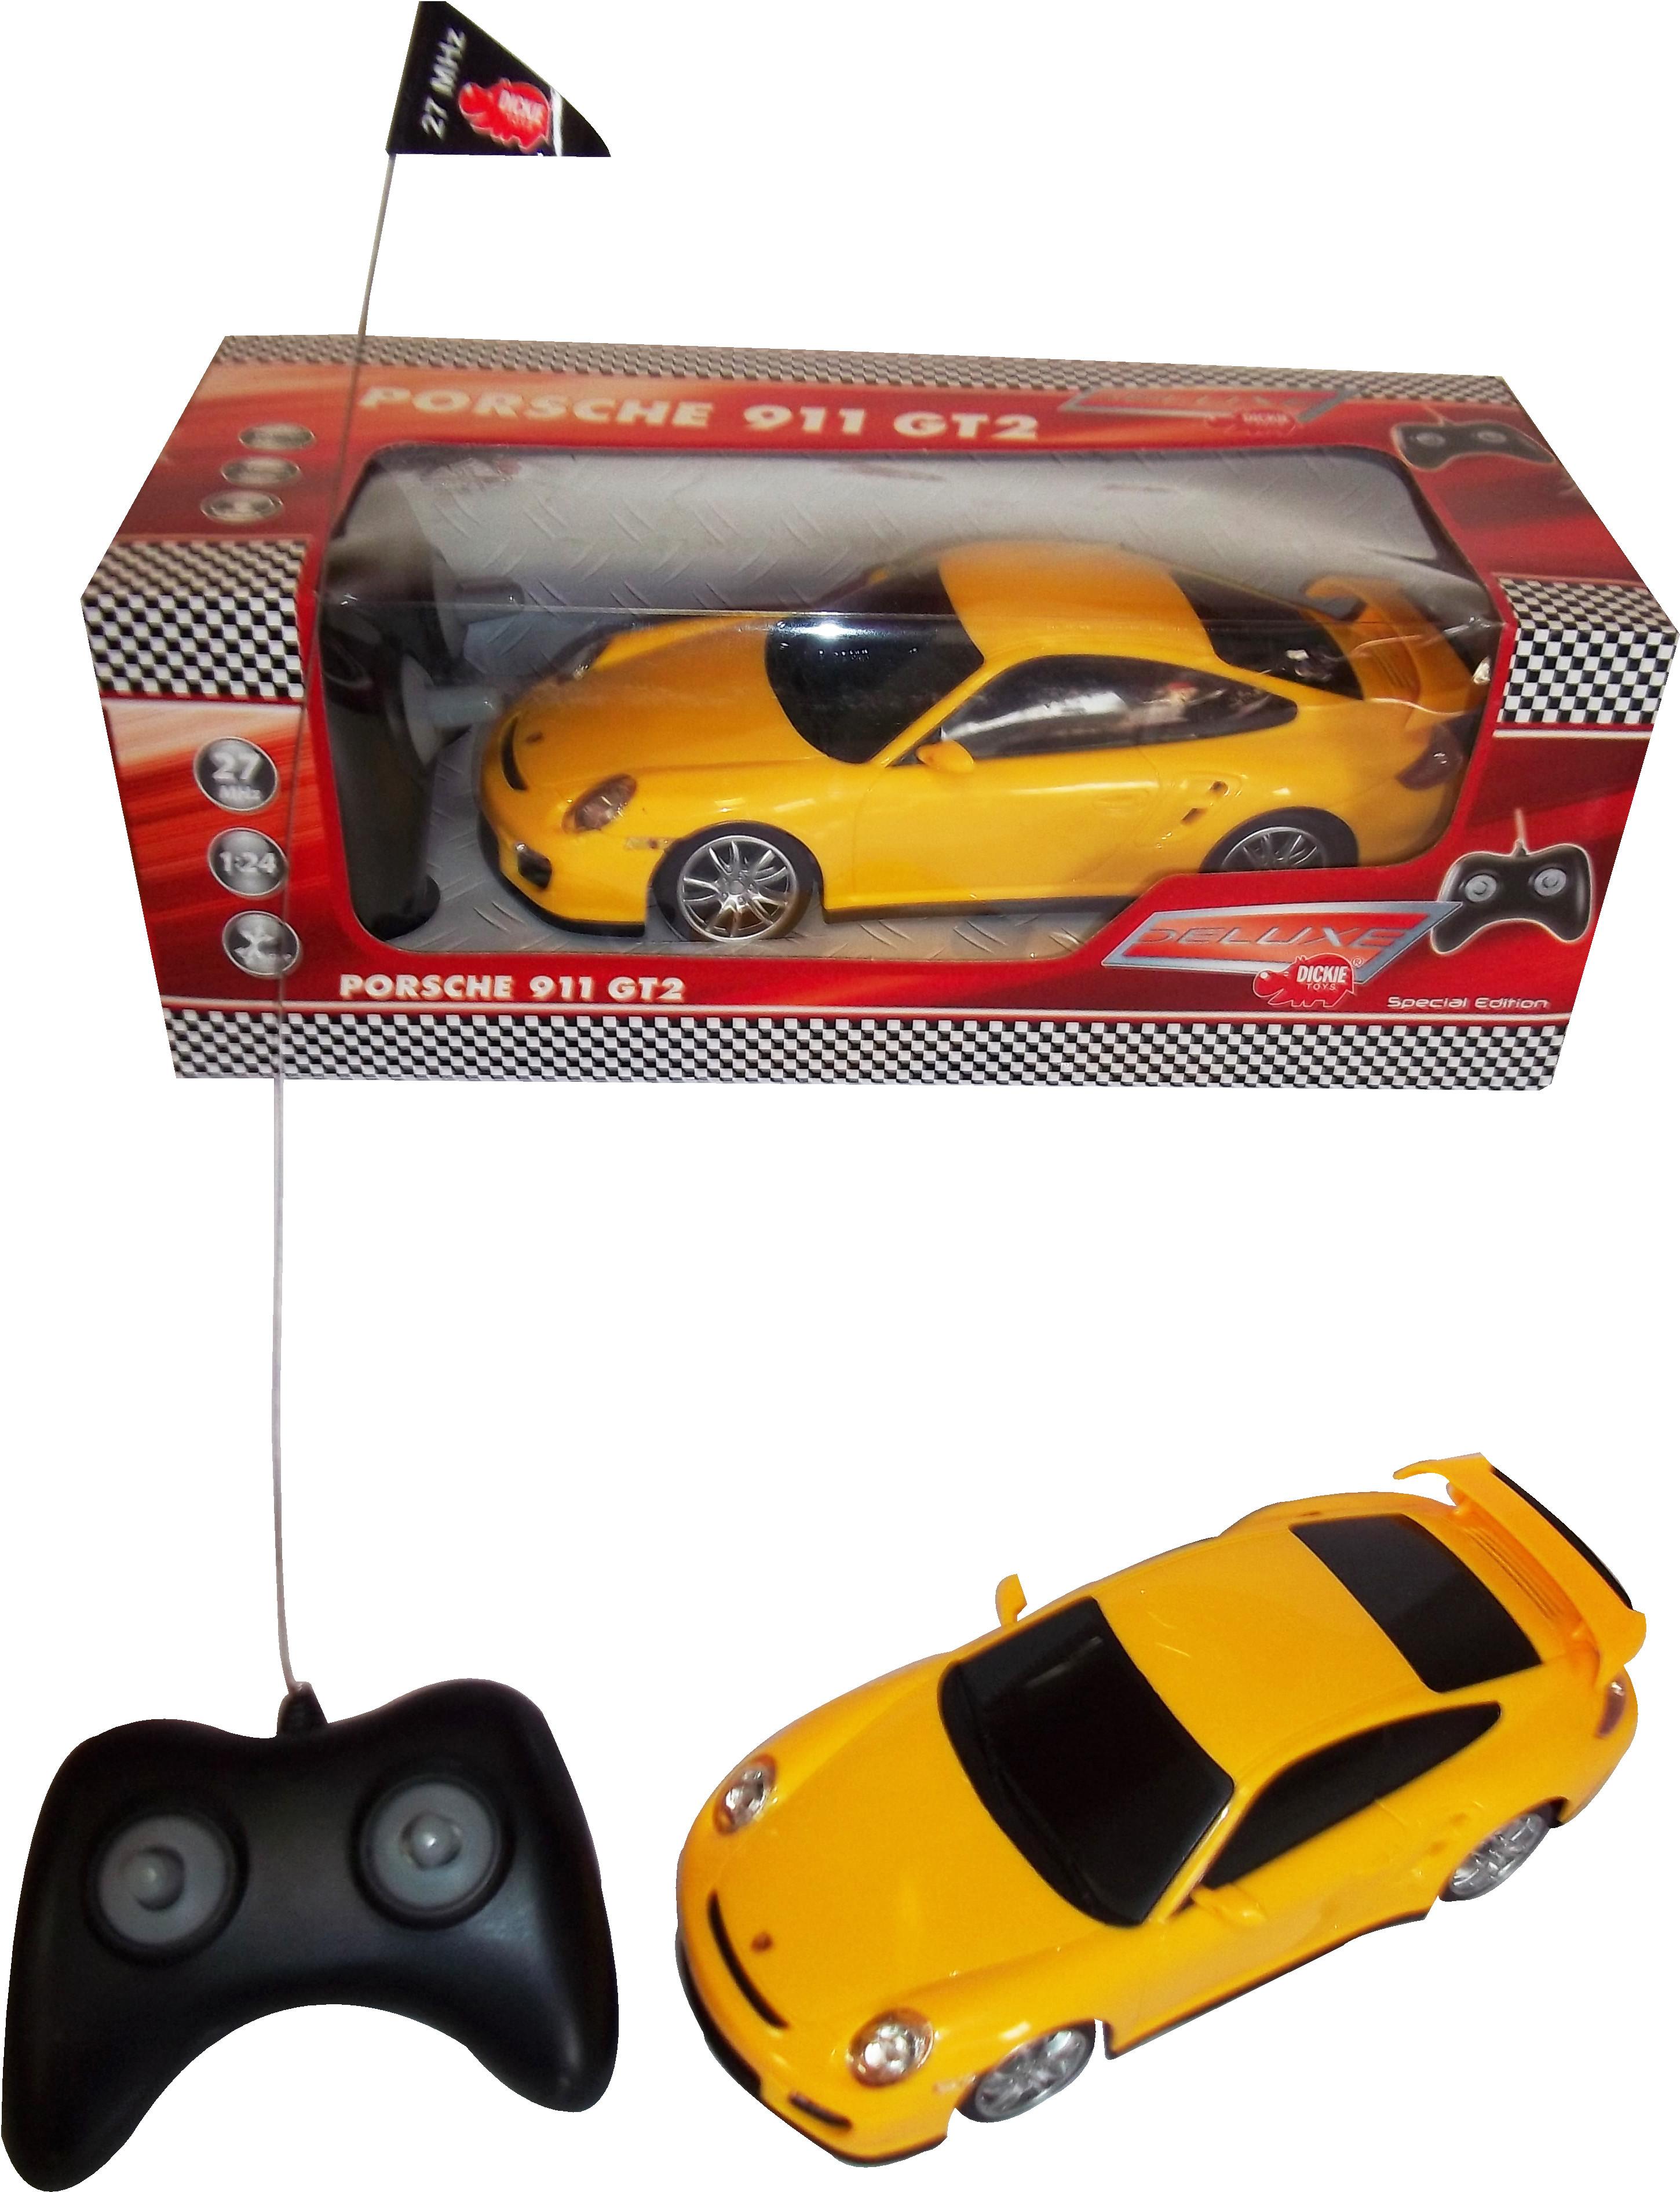 dickie-porsche-911-gt2-original-imadr4xghhfxzskx Cool Porsche 911 Gt2 Price India Cars Trend